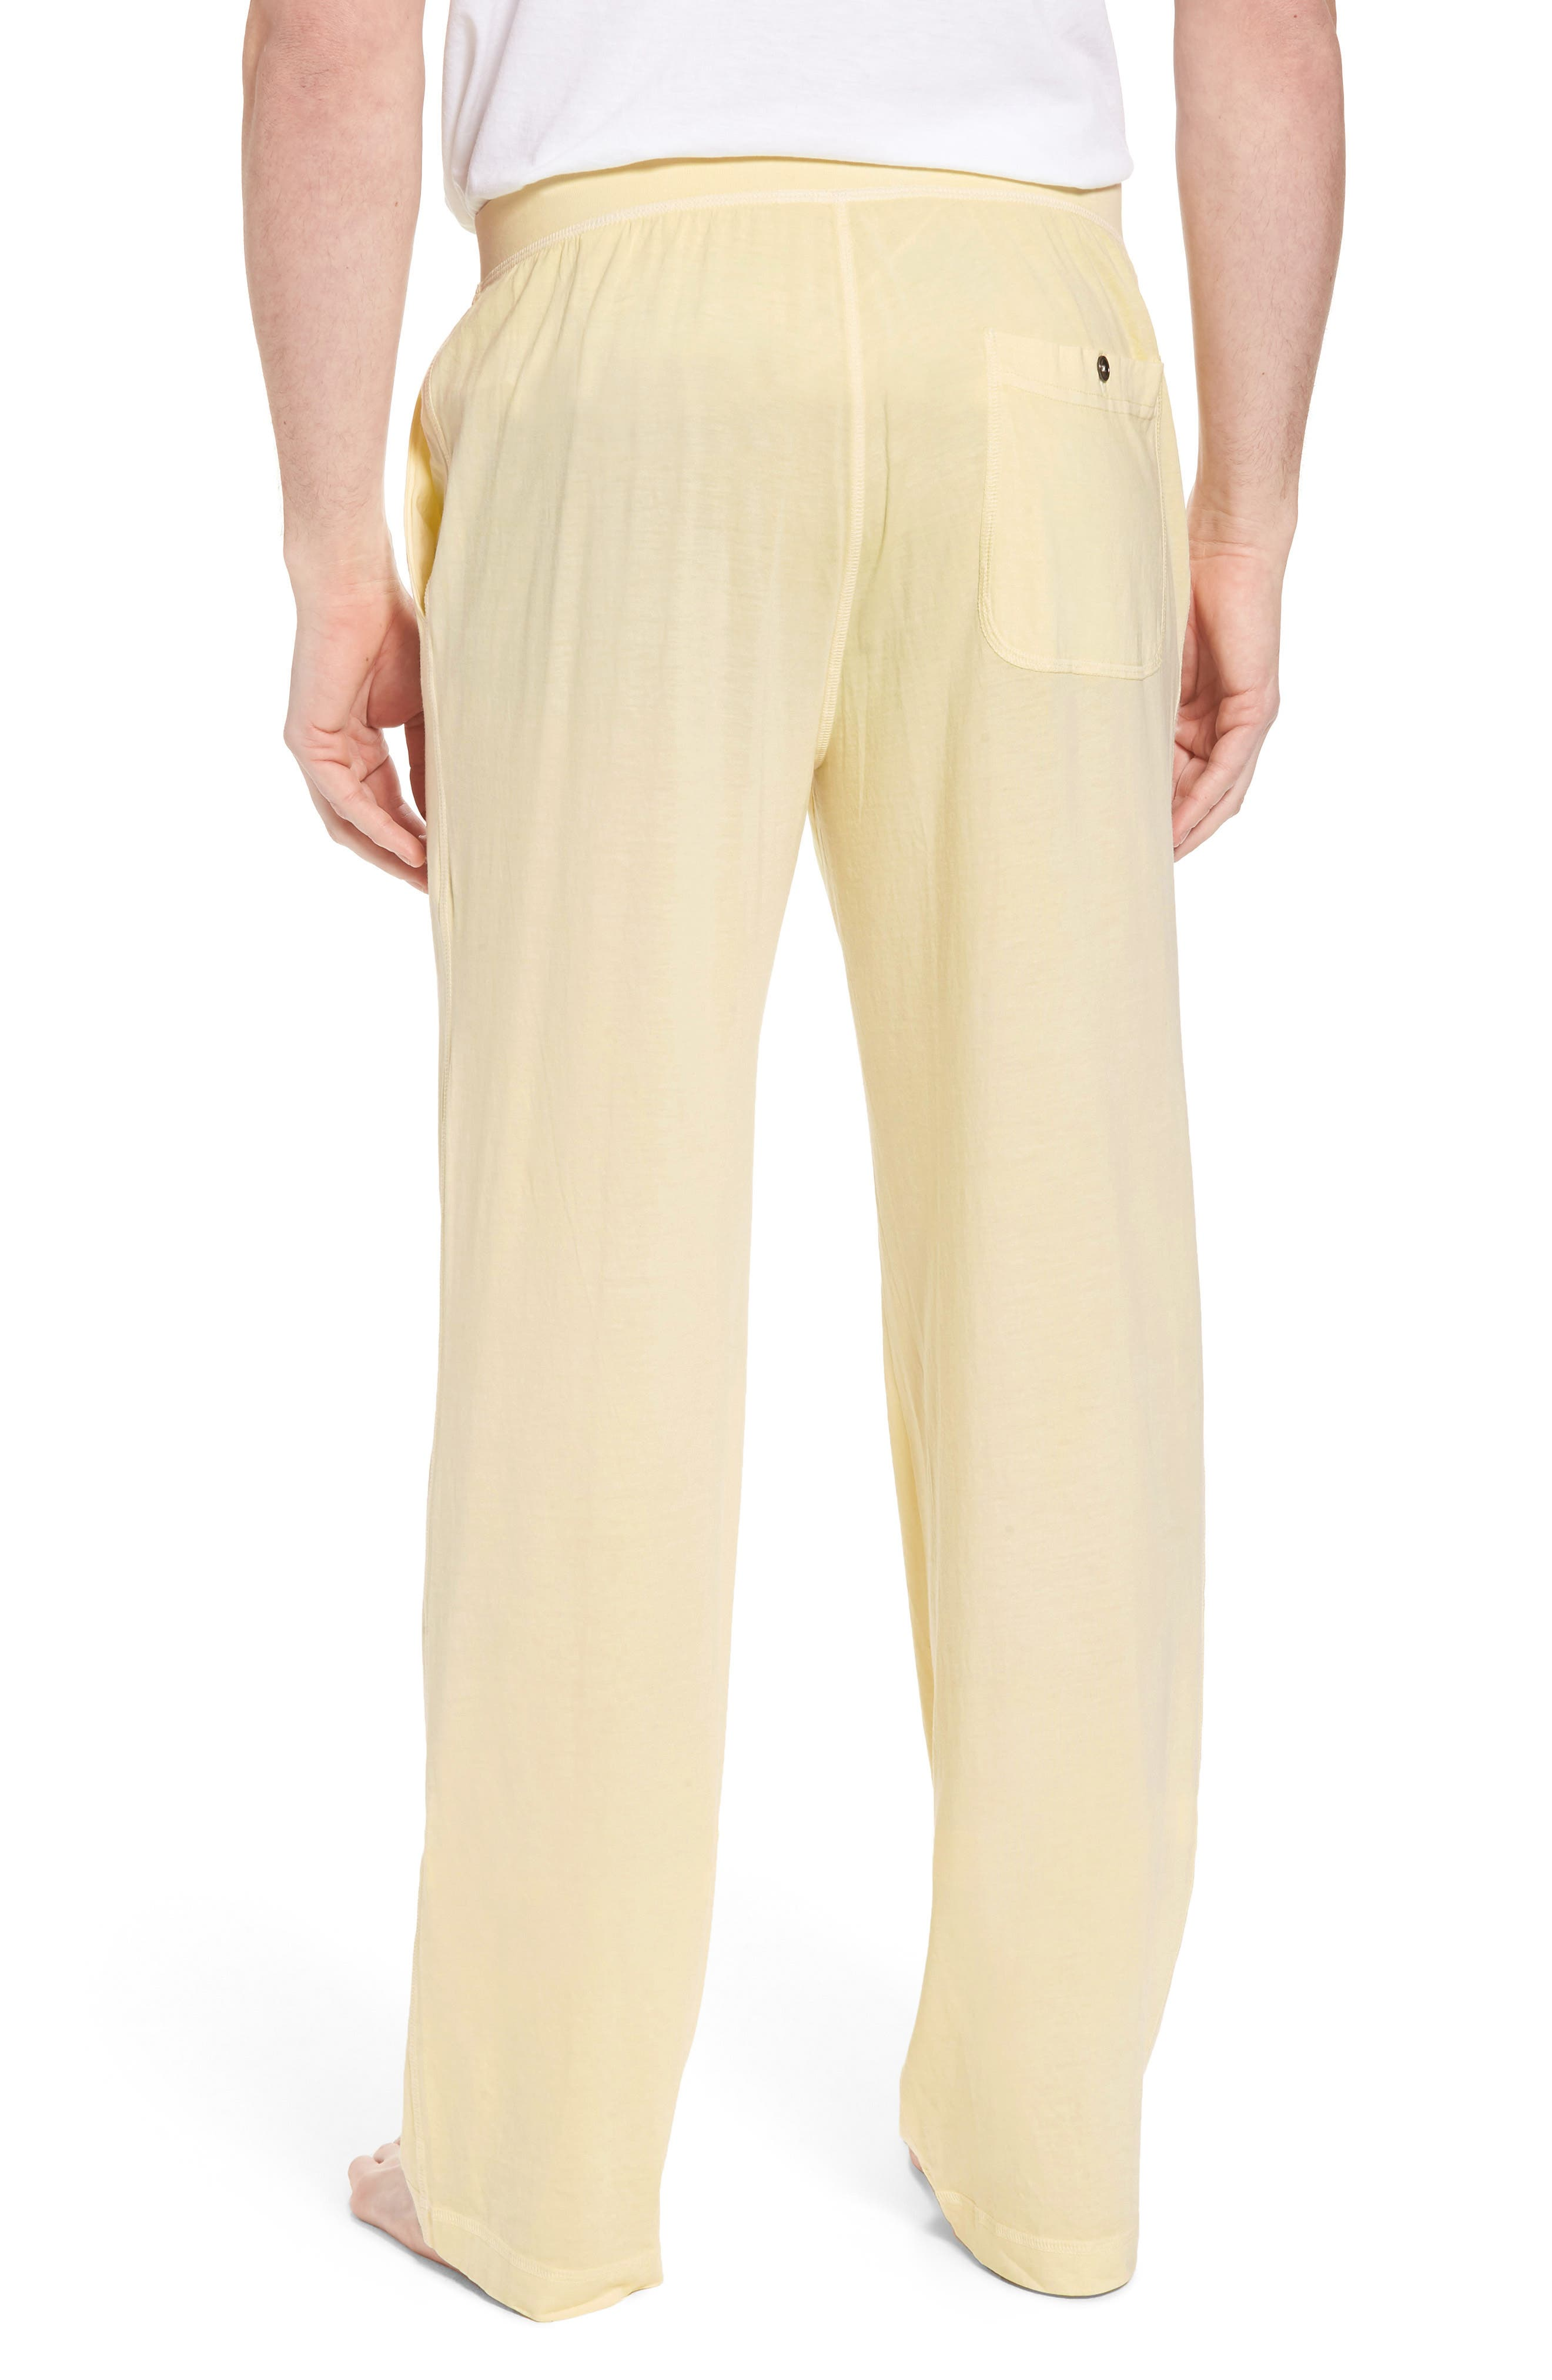 Peruvian Pima Cotton Lounge Pants,                             Alternate thumbnail 2, color,                             YELLOW